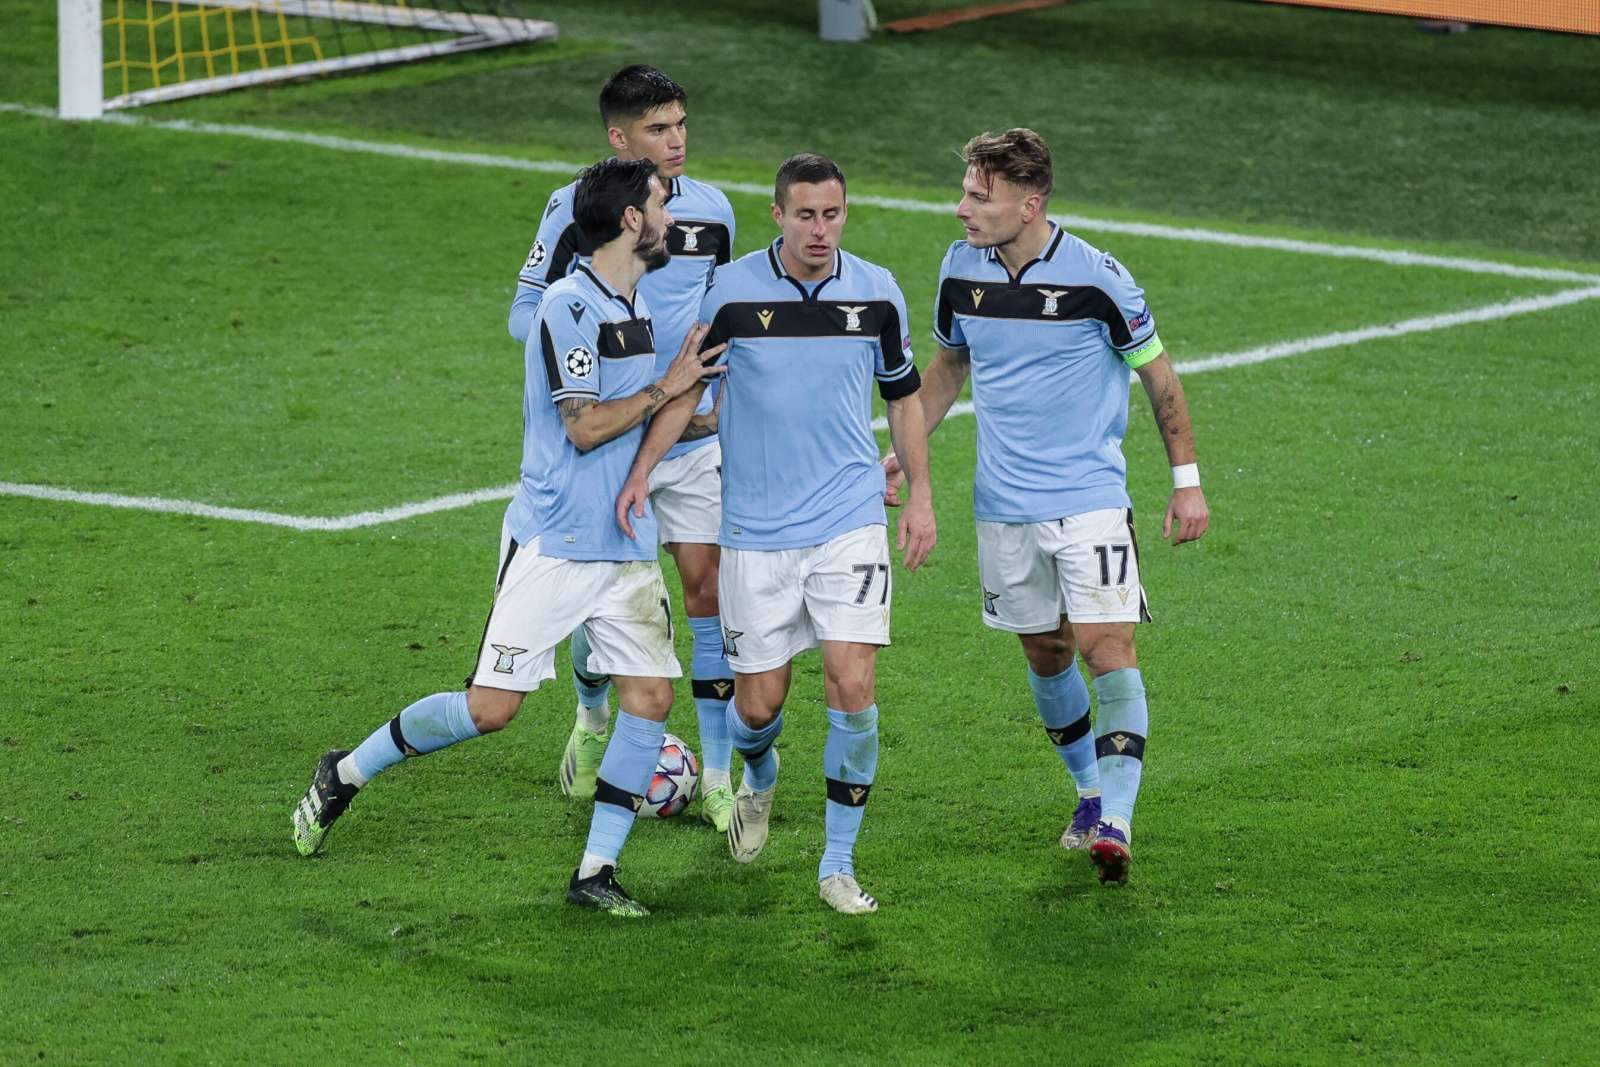 «Лацио» - «Бавария»: прогноз на матч Лиги чемпионов – 23 февраля 2021